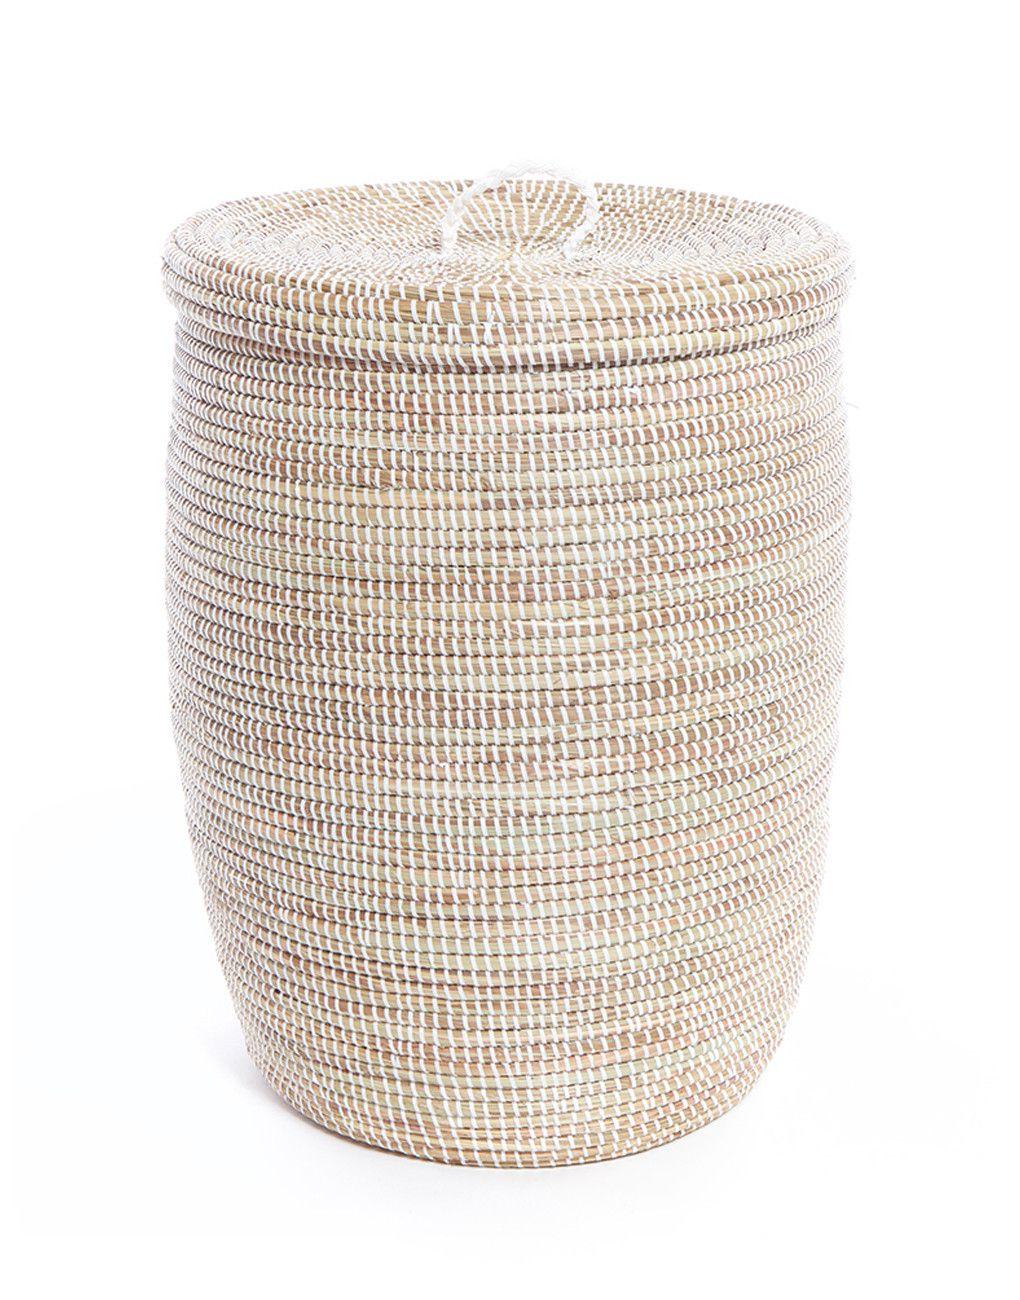 Tall Hamper White Laundry Hamper Woven Baskets Storage Woven Hamper